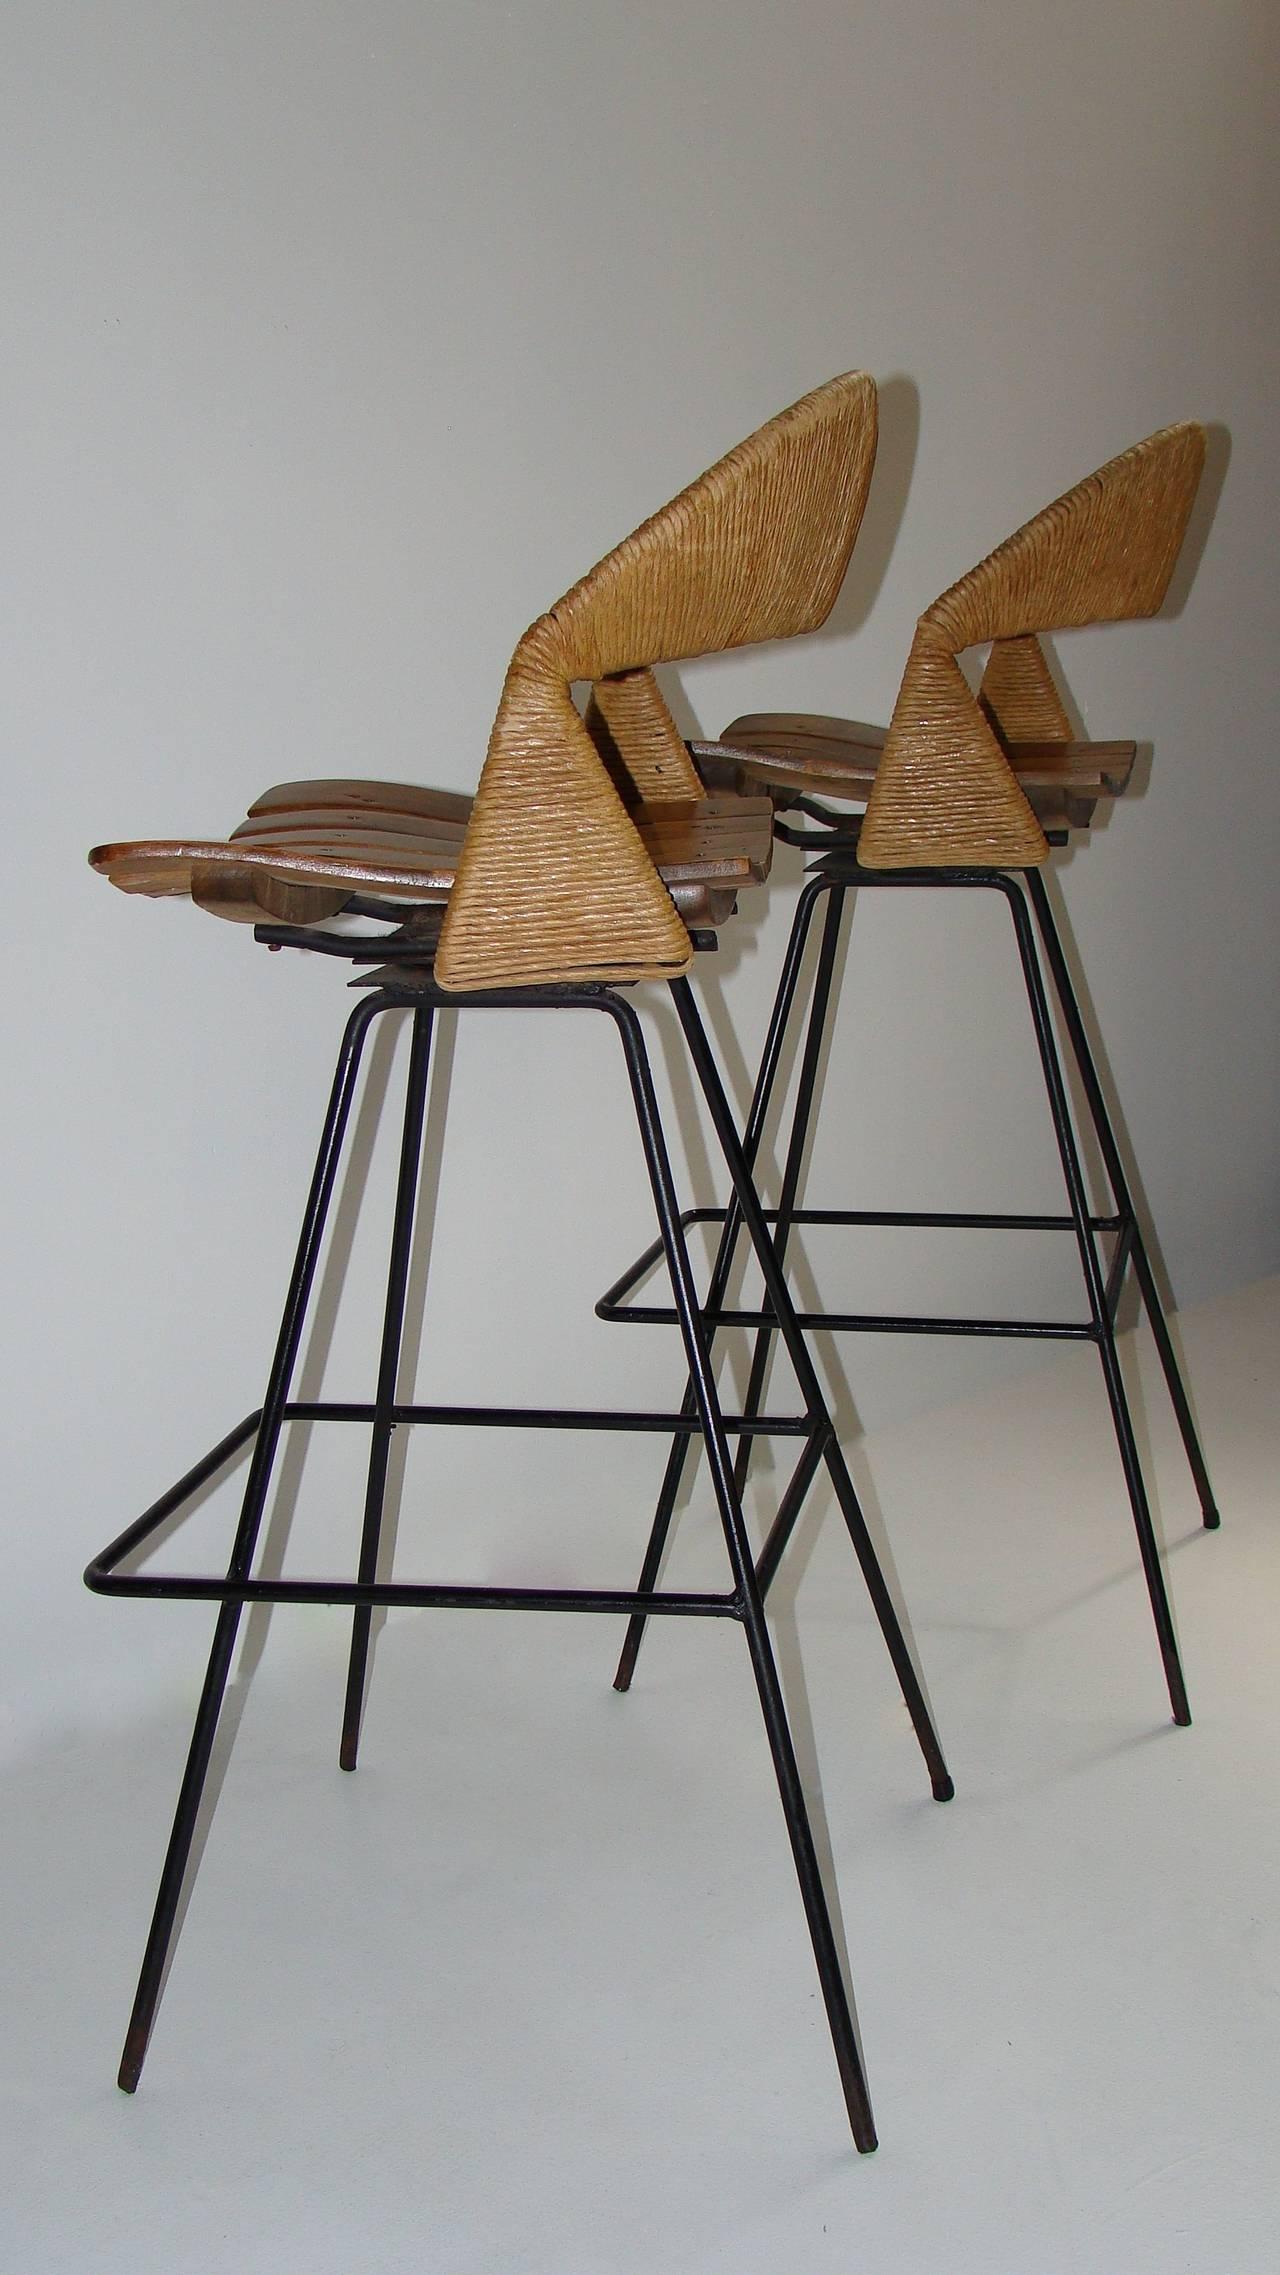 Pair Of Sculptural Bar Stools Designed By Arthur Umanoff